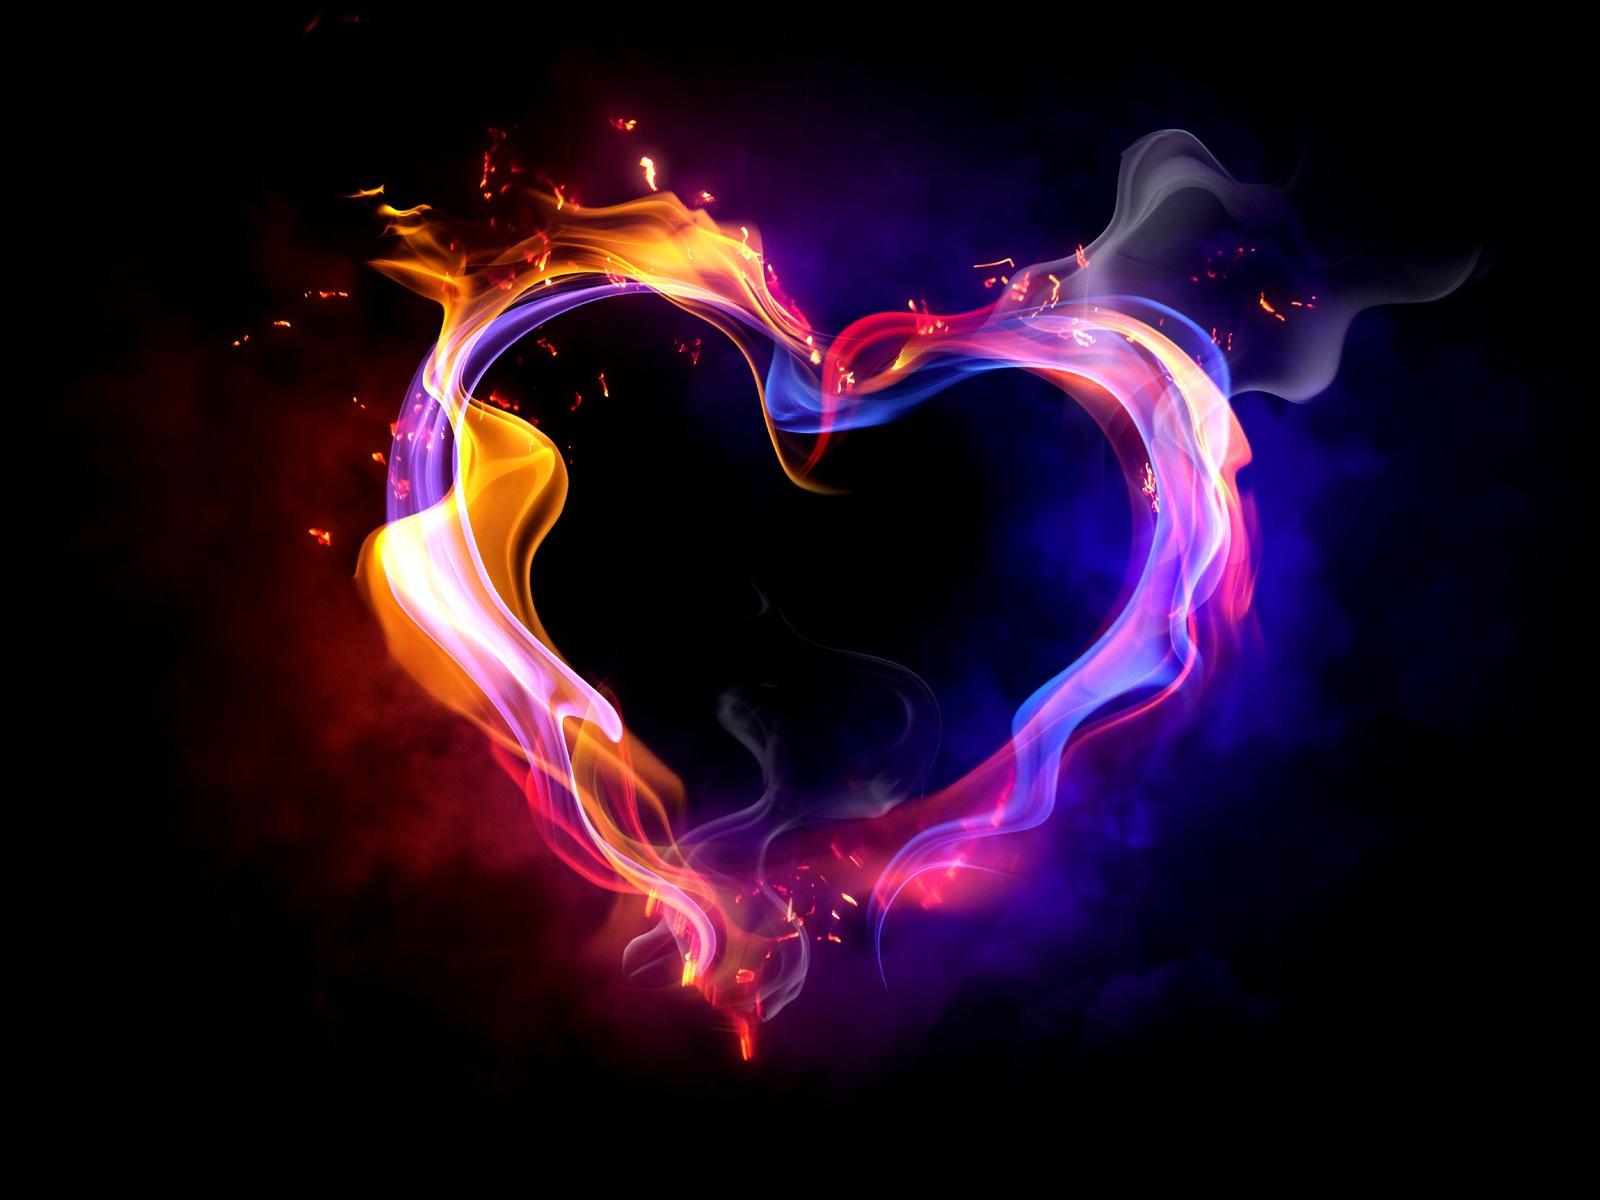 Pap 233 Is De Parede Amor Cora 231 227 O Fogo Fuma 231 A Multi Colorido 1600x1200 Hd Imagem